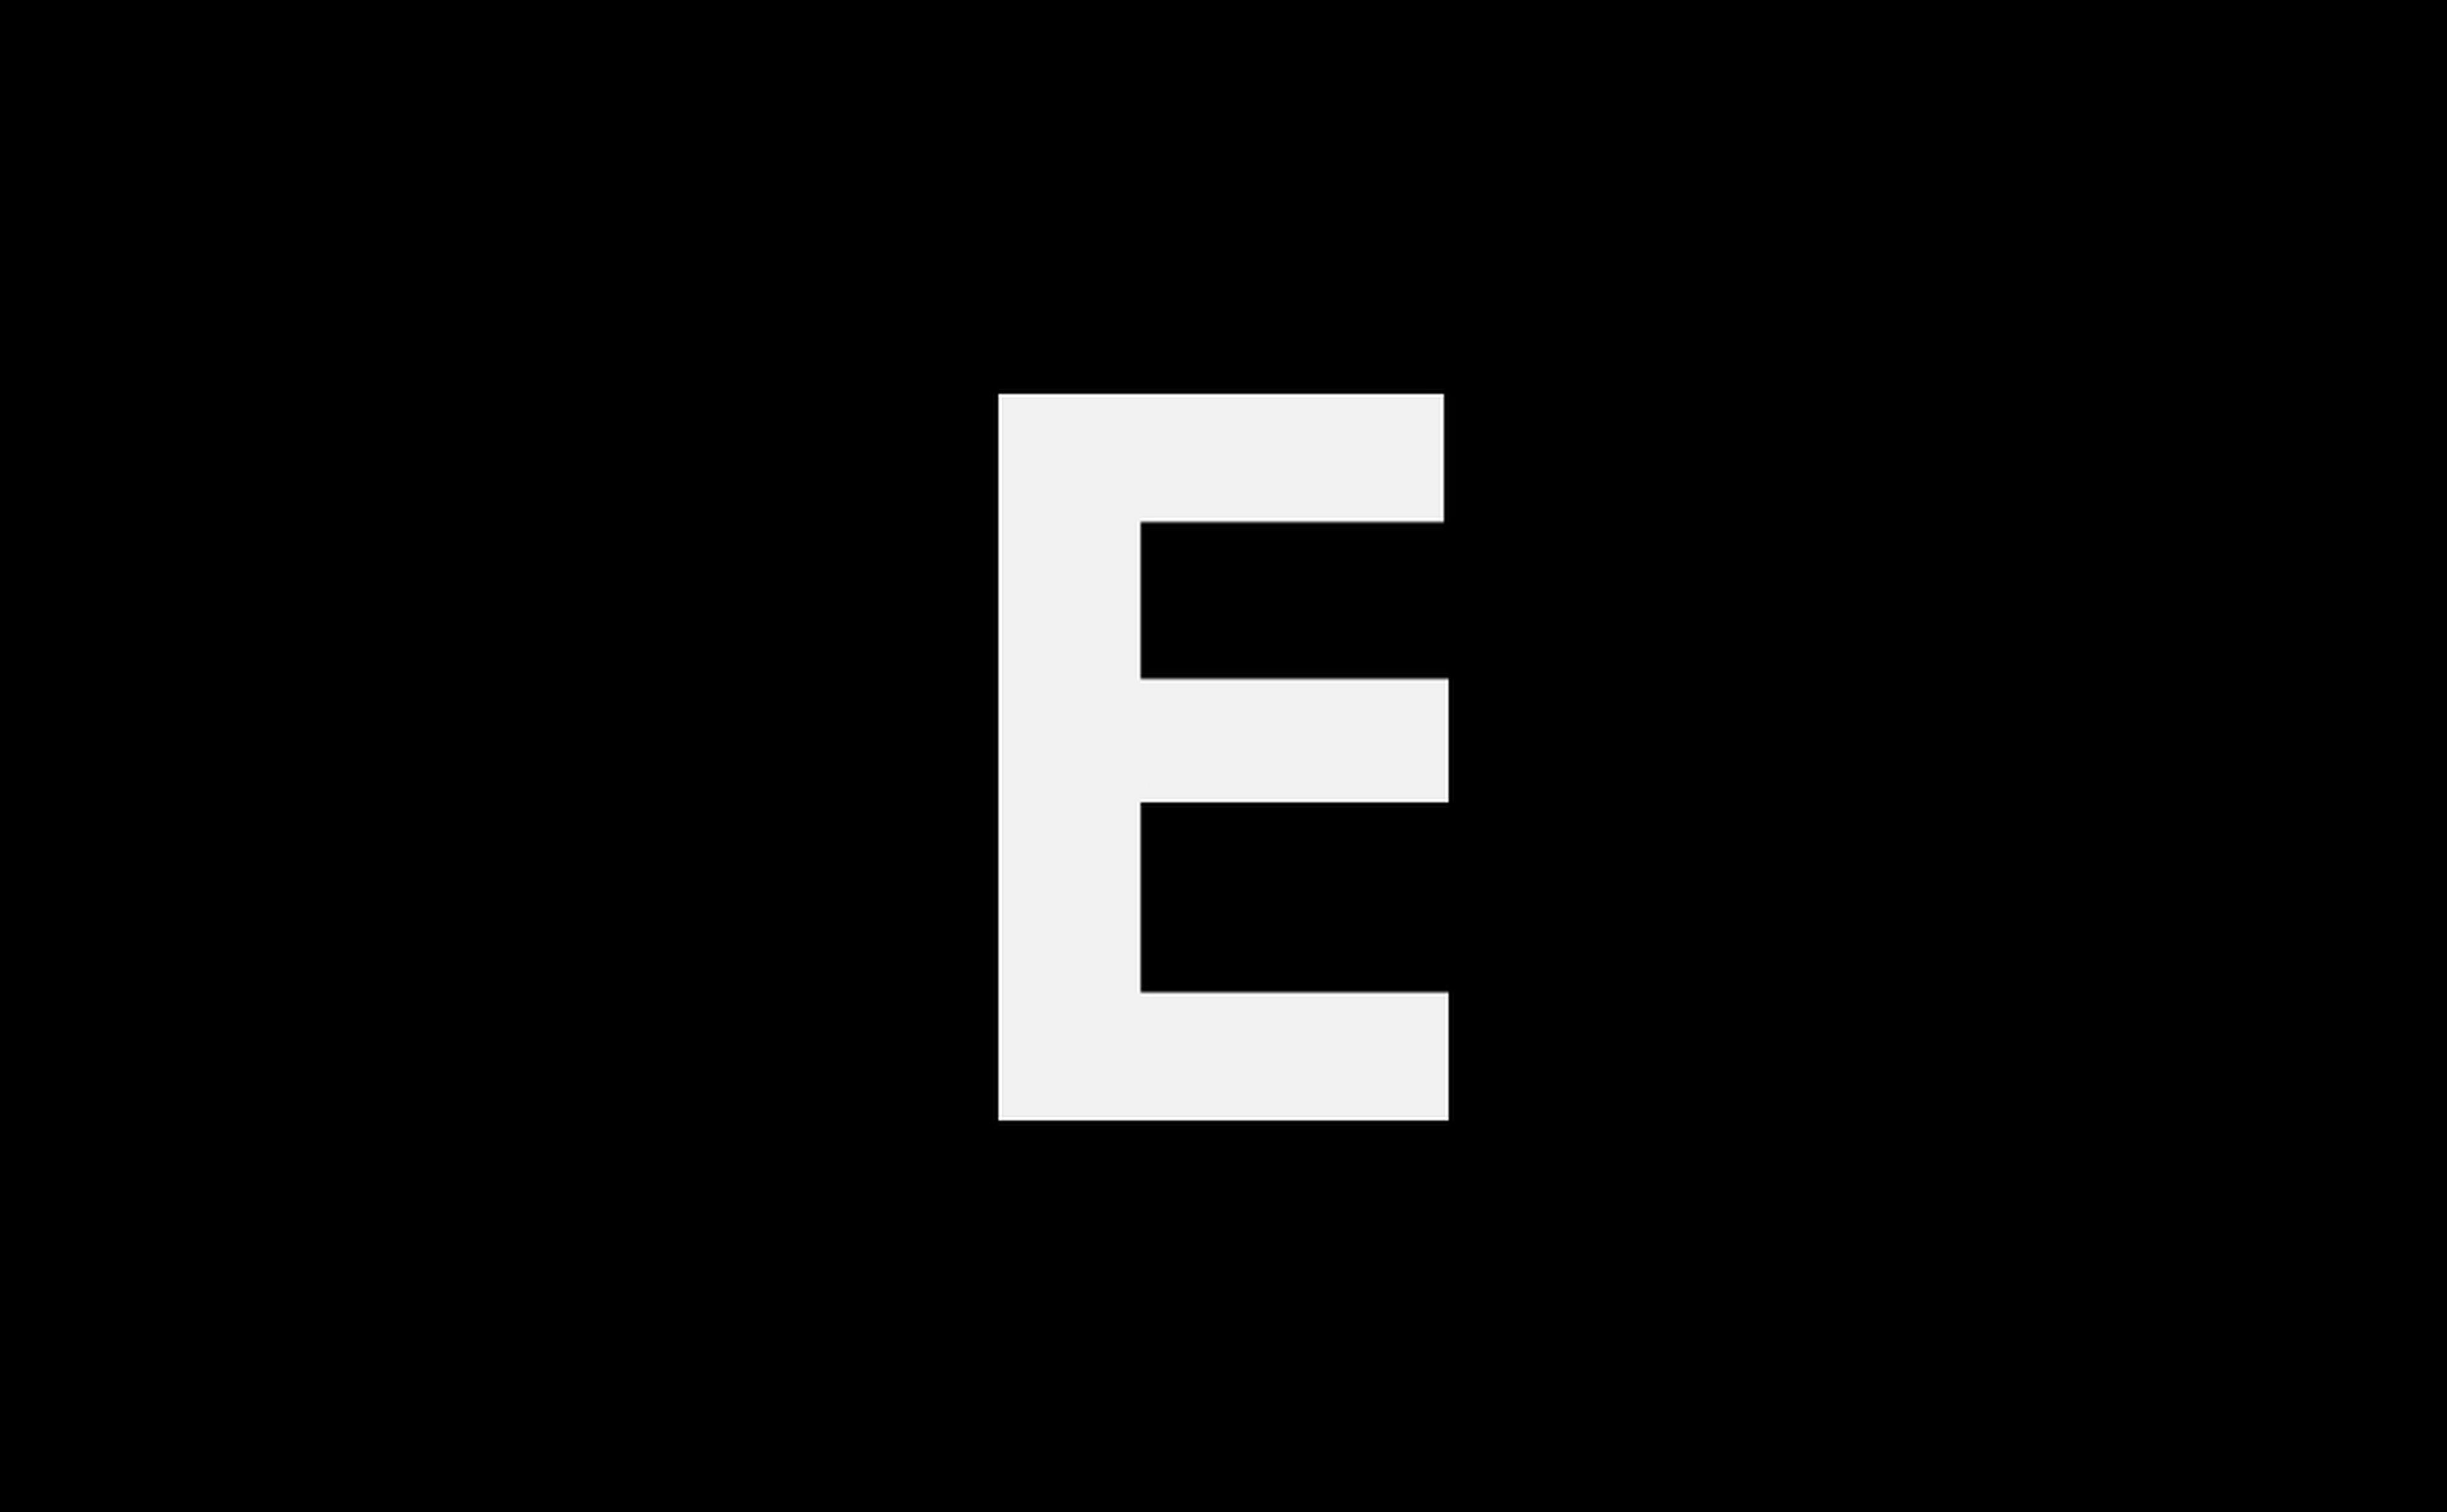 Fourrure sur pied Casual Clothing Dress Face, Expressive, Model, Fur, Mature, Foot, Lingerie, Nylons, High Heel Face, Expressive, Model, Fur, Mature, Foot, Lingerie, Nylons, High Heels Fashion High Heels Lifestyles Standing